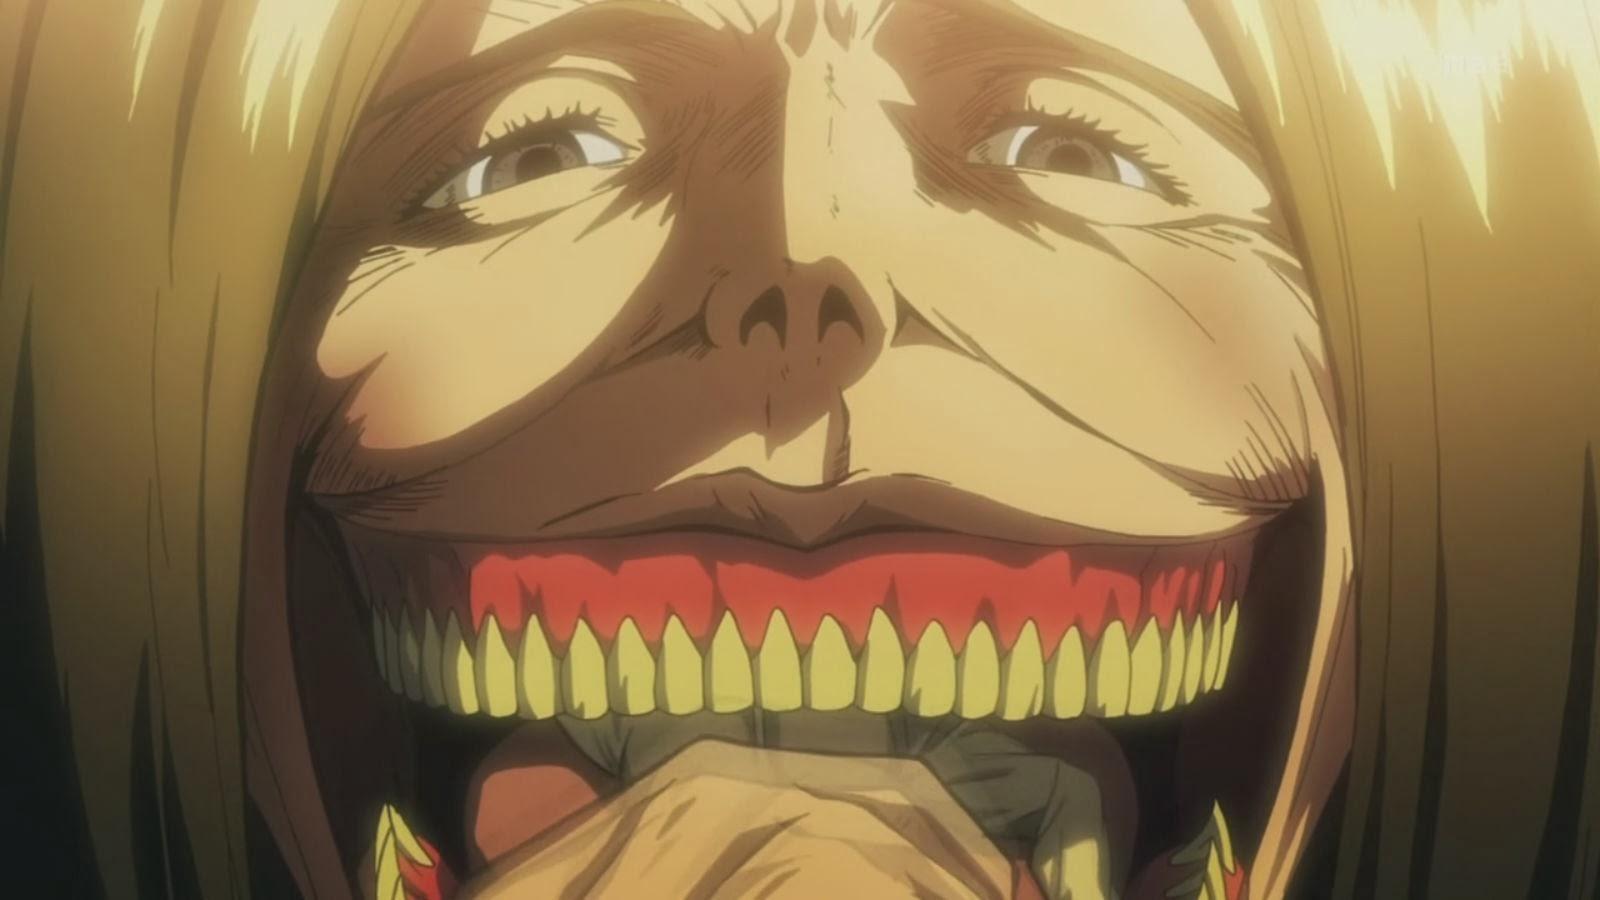 Sangre De Titan [Shingeki No Kyojin Fan-Fiction] Shingeki-no-kyojin-01-titan-meal-time+%25281%2529